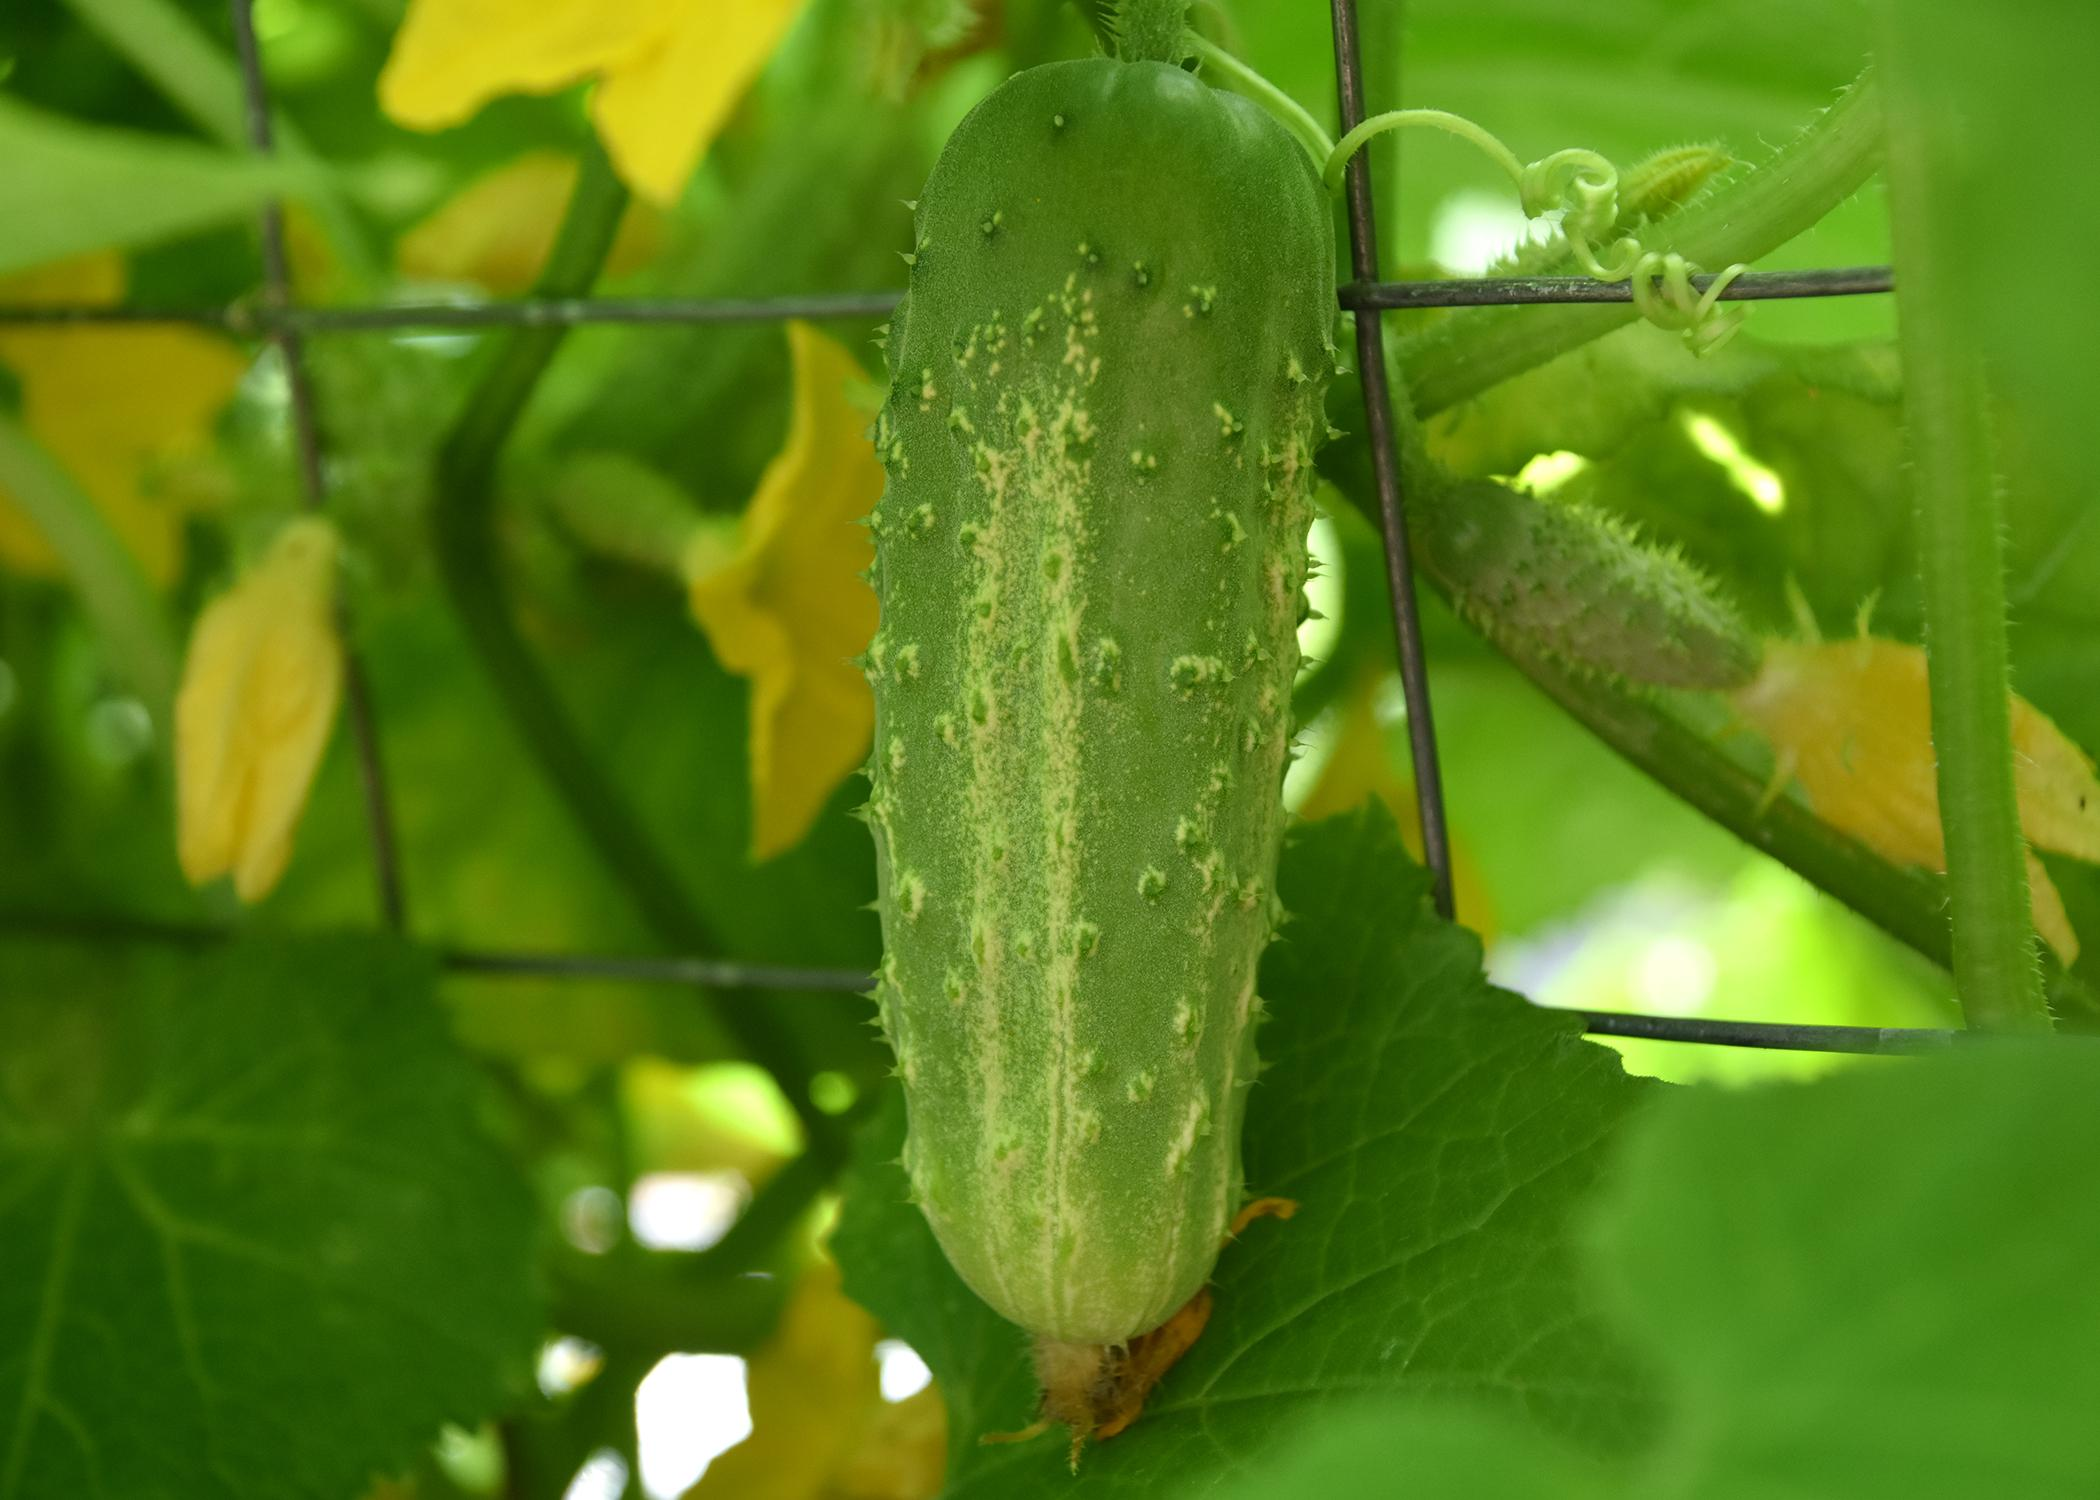 A single, green cucumber hangs on a vine.